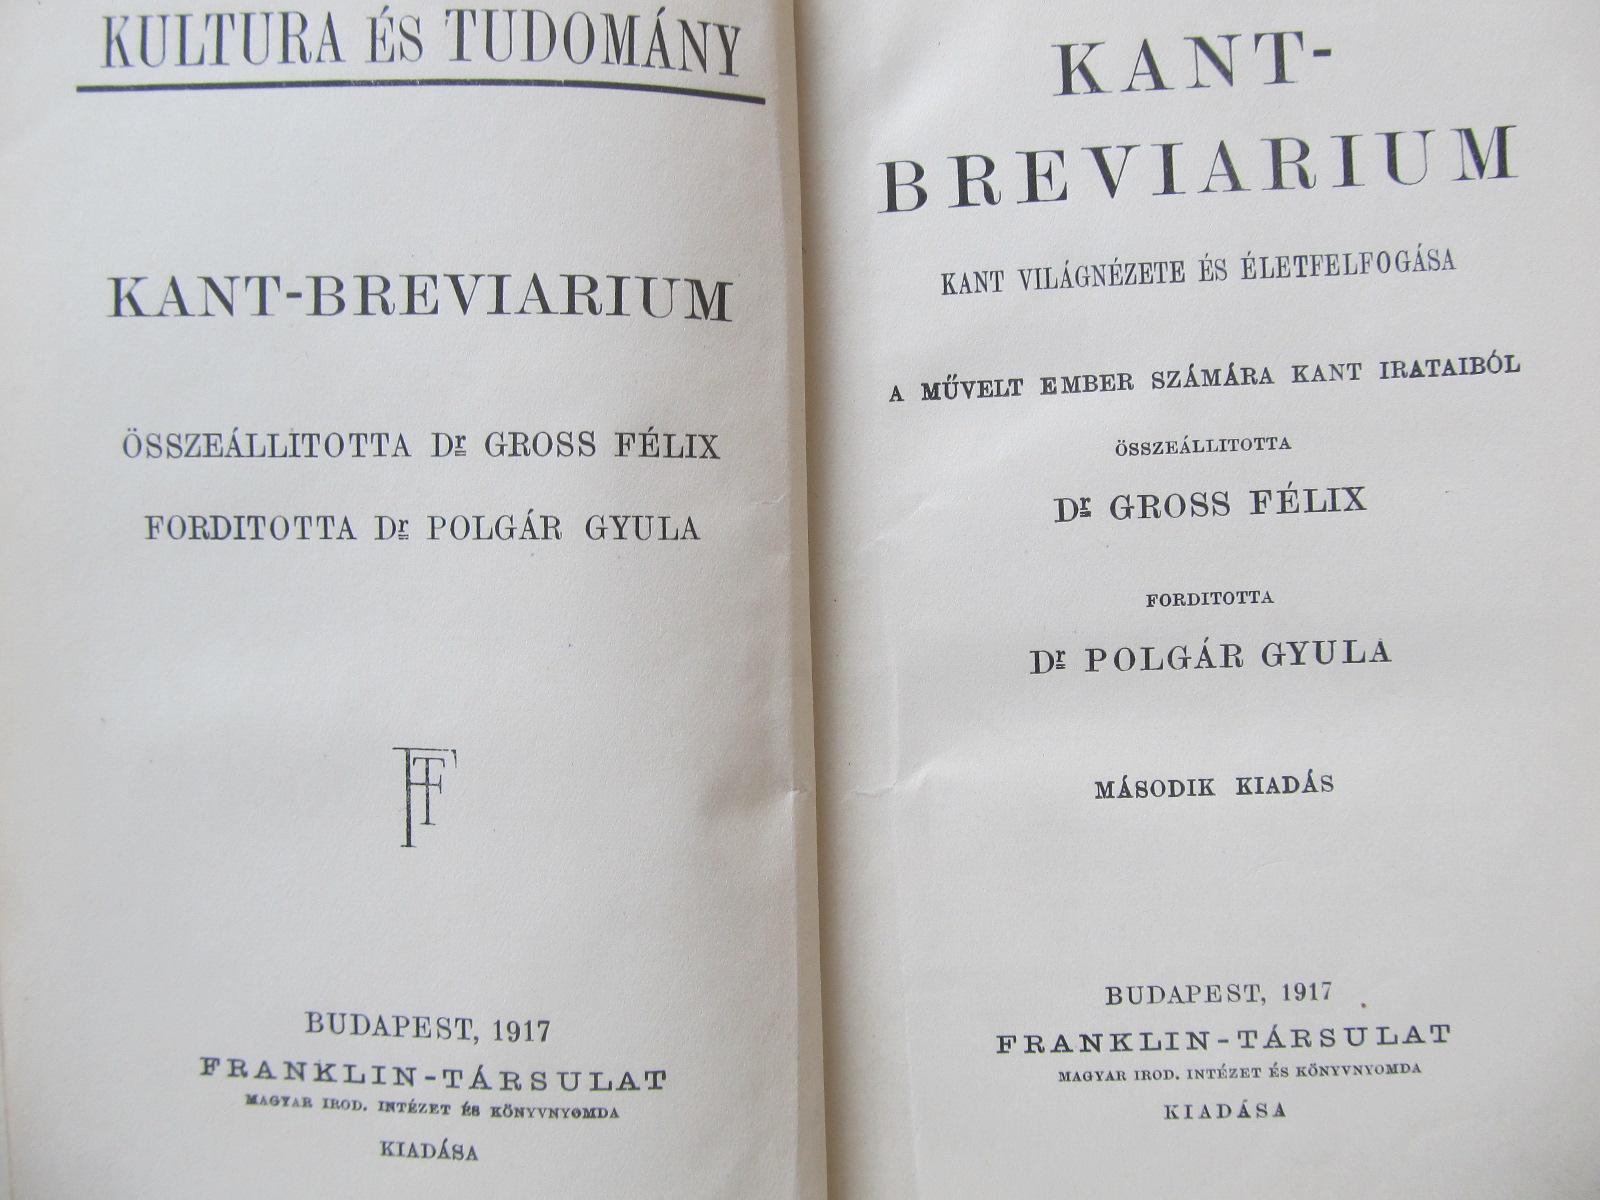 Carte Kant breviarium , 1917 - osszeallitotta Gross Felix